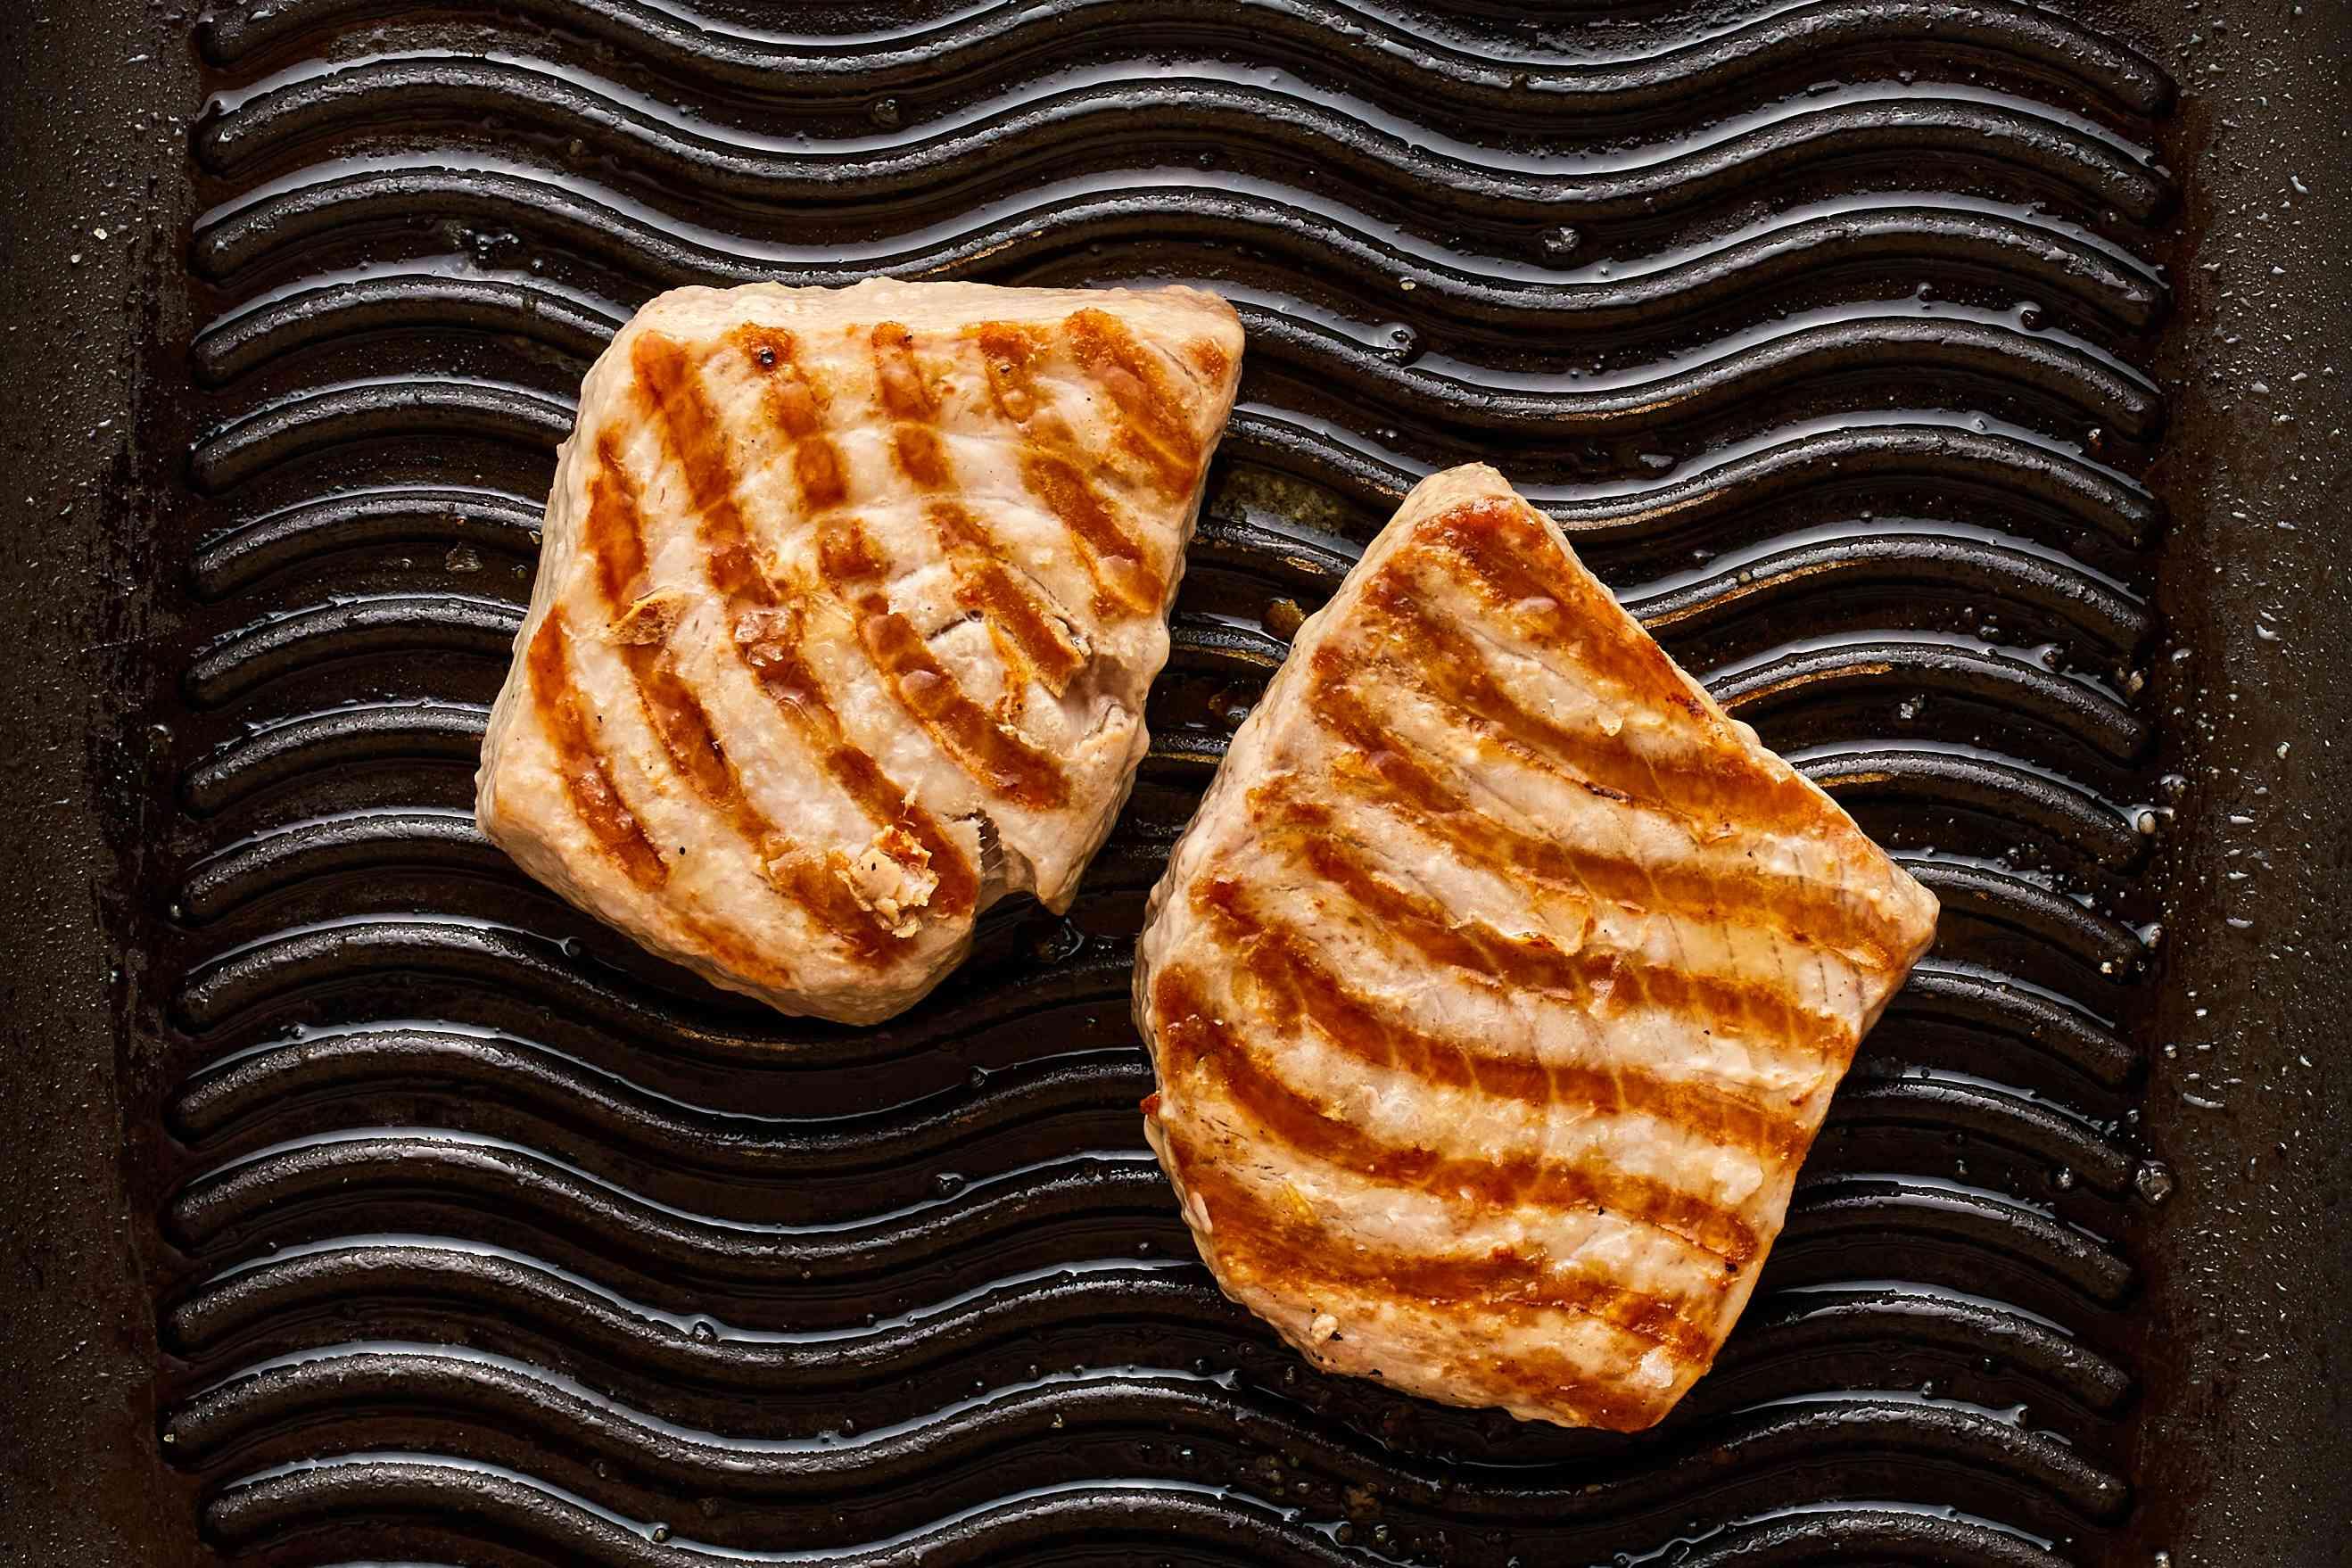 Tuna steaks on grill pan